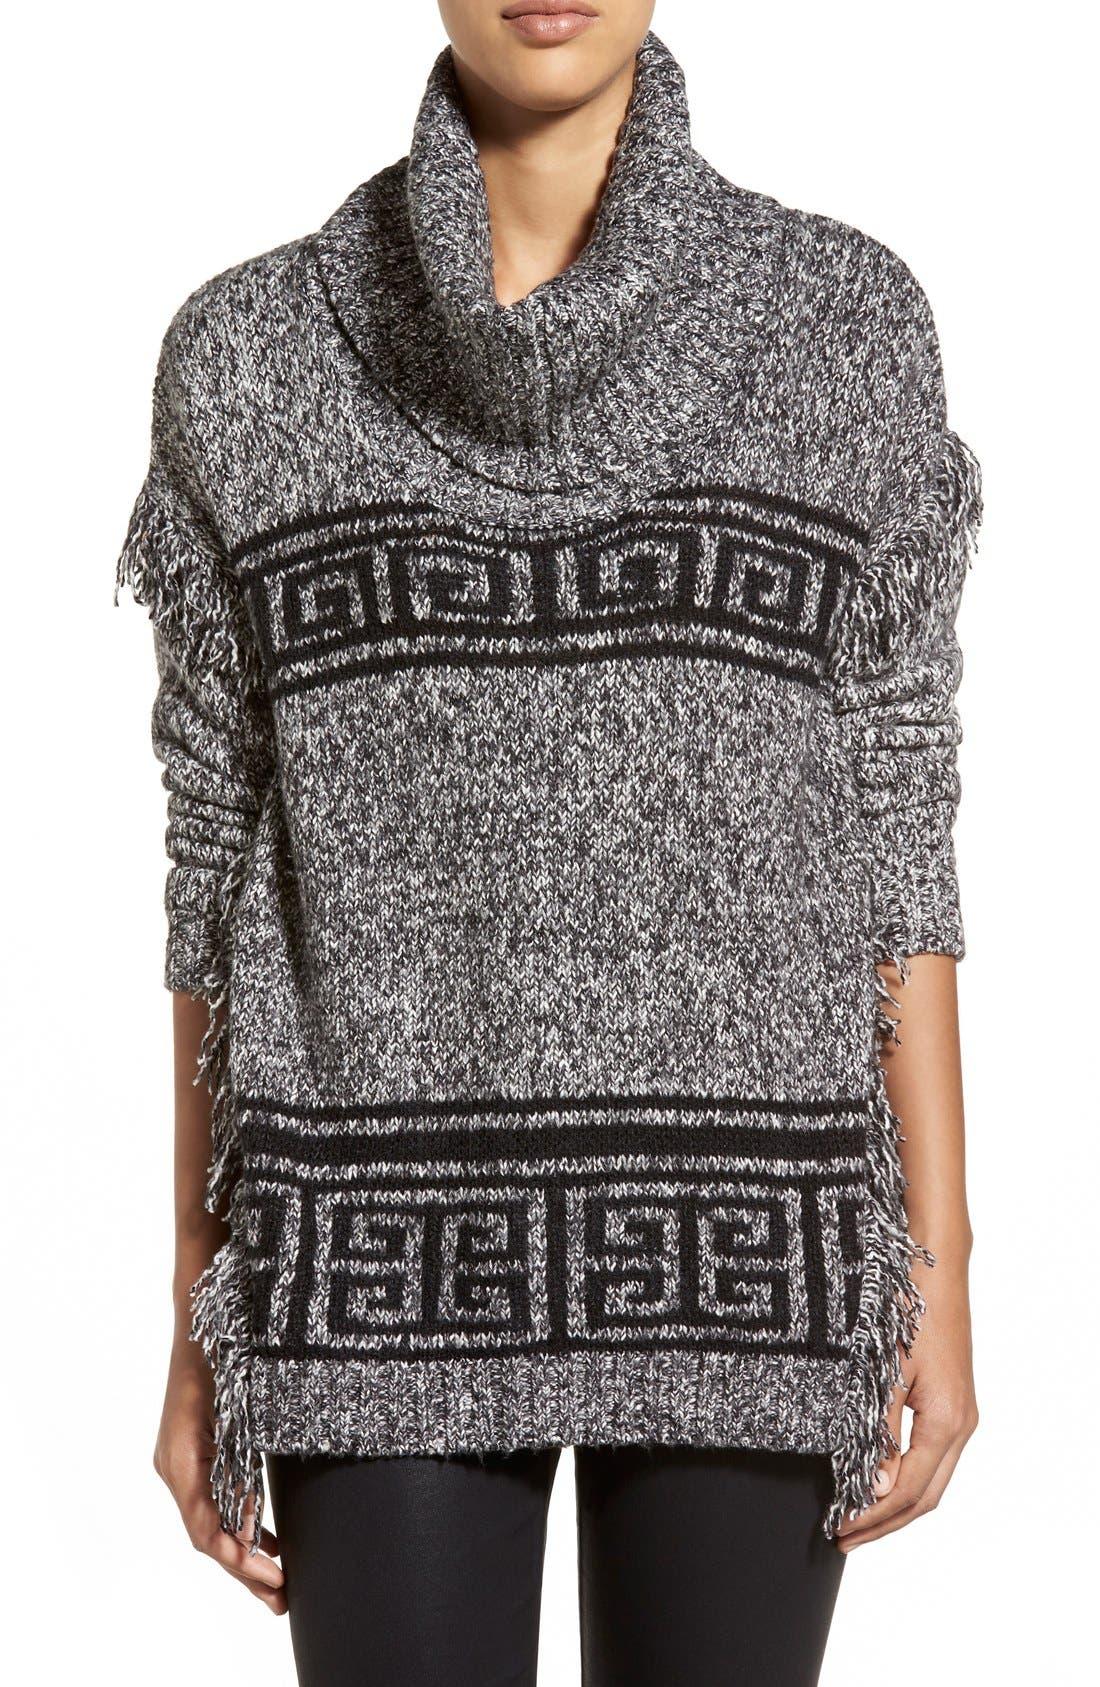 Alternate Image 1 Selected - kensie Fringe Trim Turtleneck Sweater